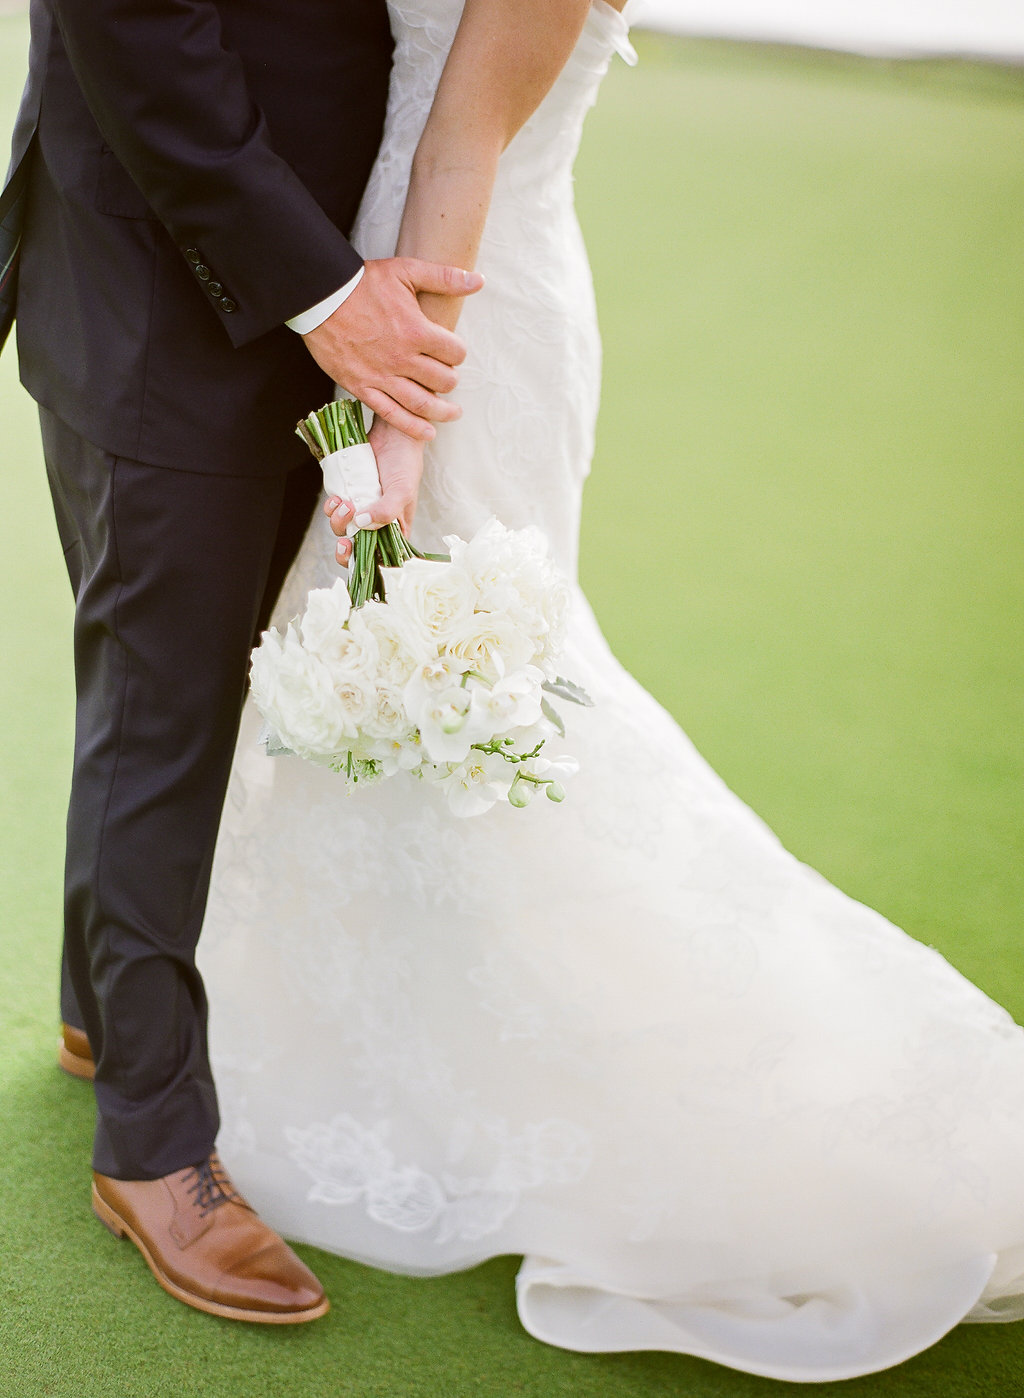 Wedding by the sea, Events by Reagan, Kiawah Wedding, Charleston Wedding Planner, Bride Bouquet